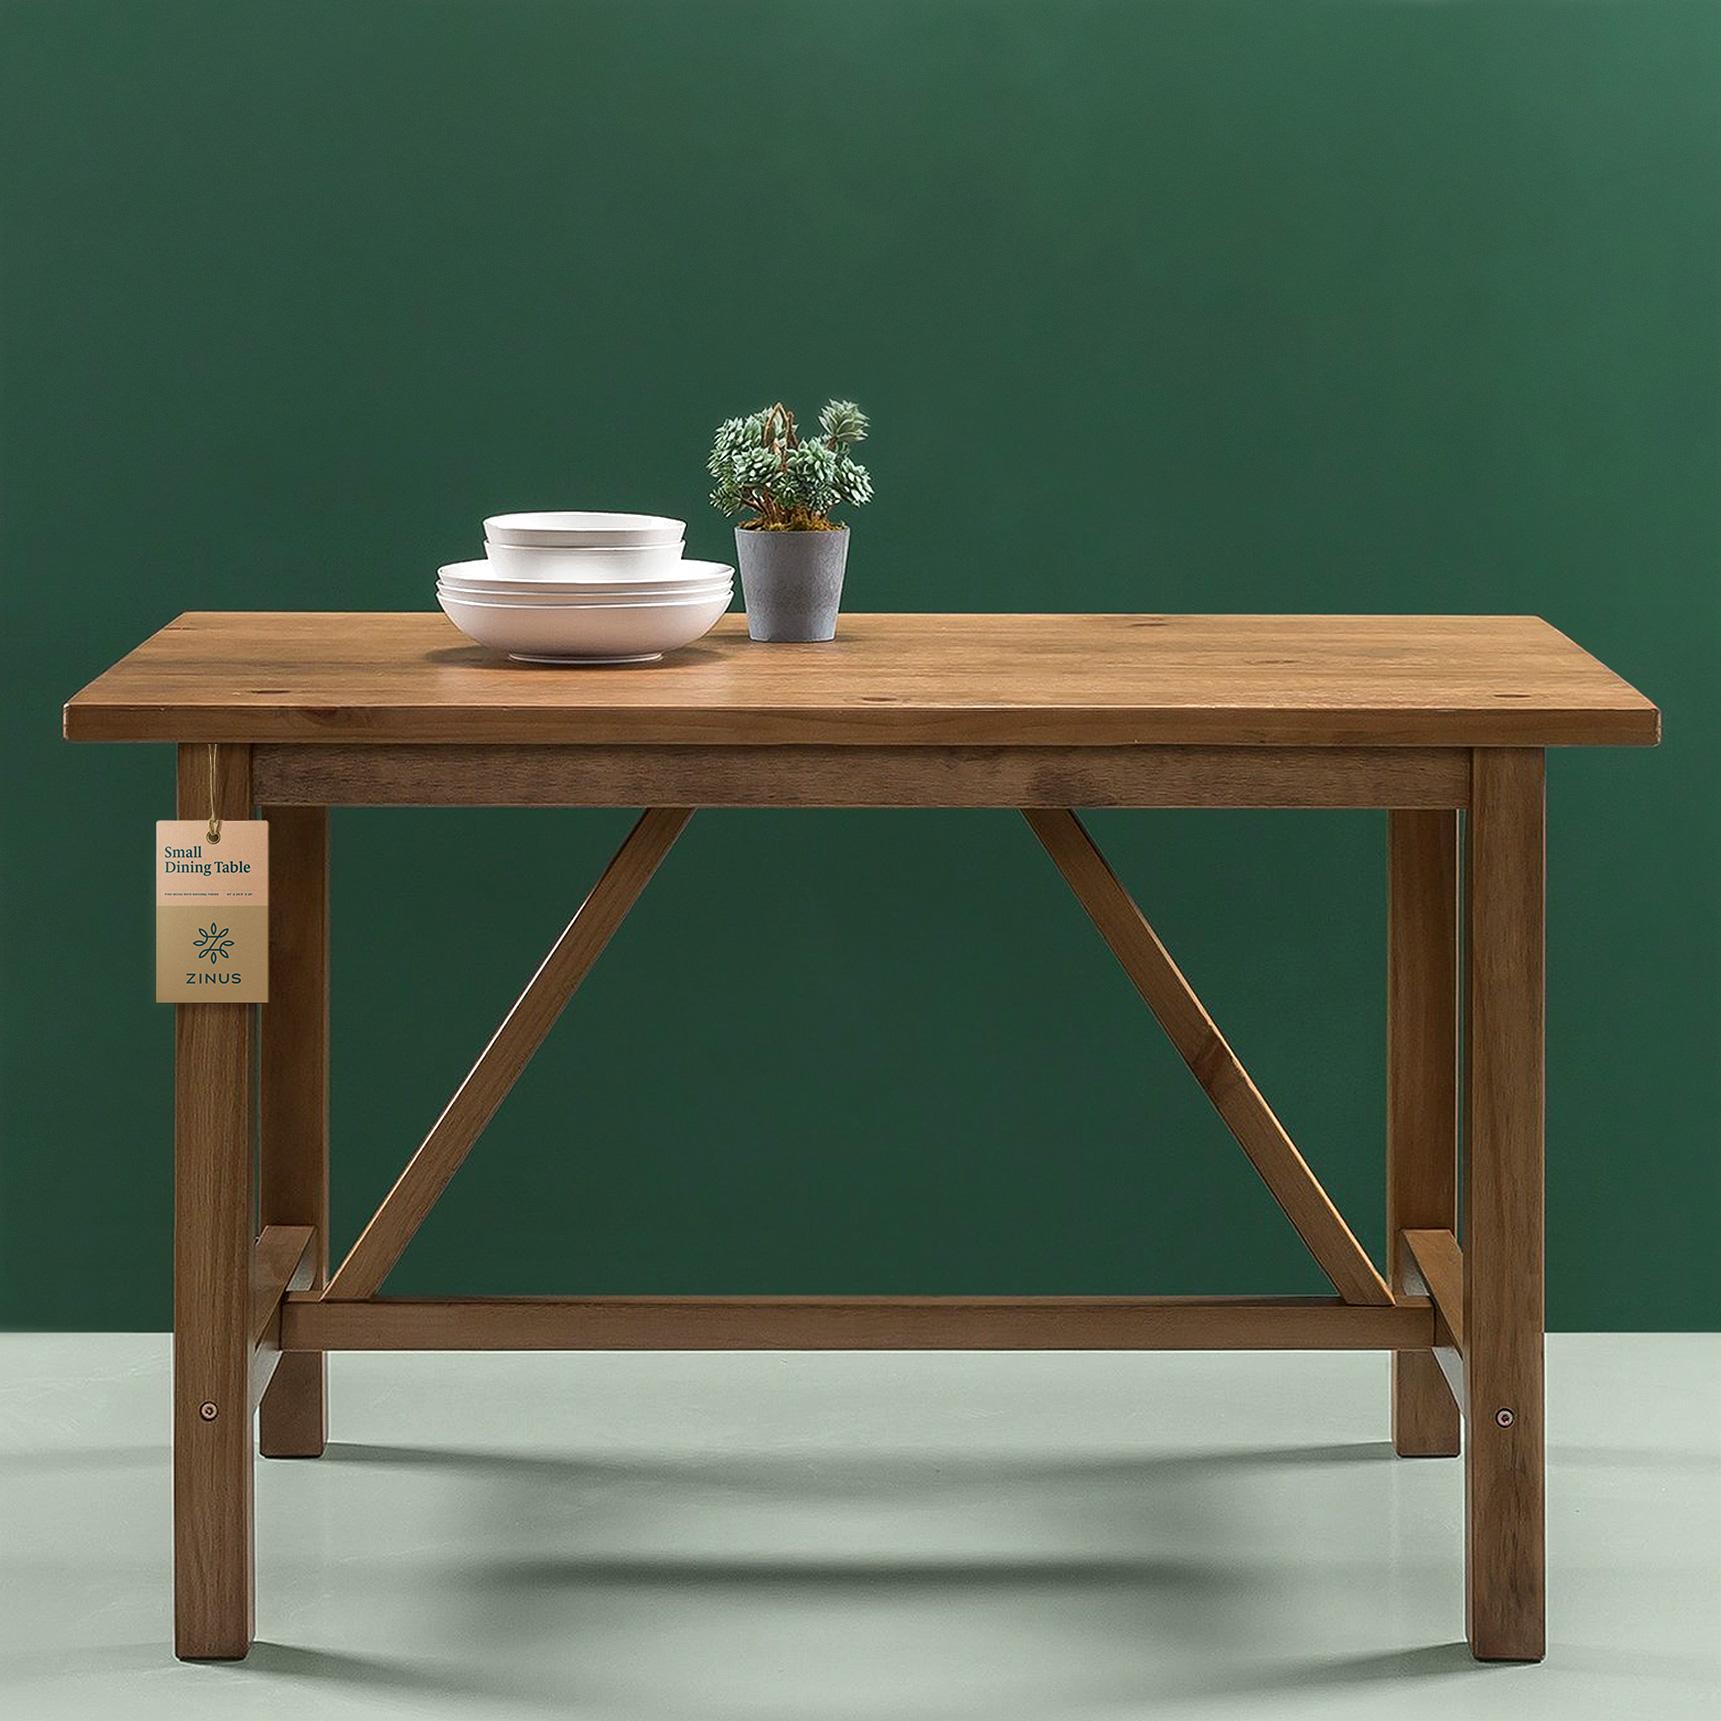 Table-square.jpg